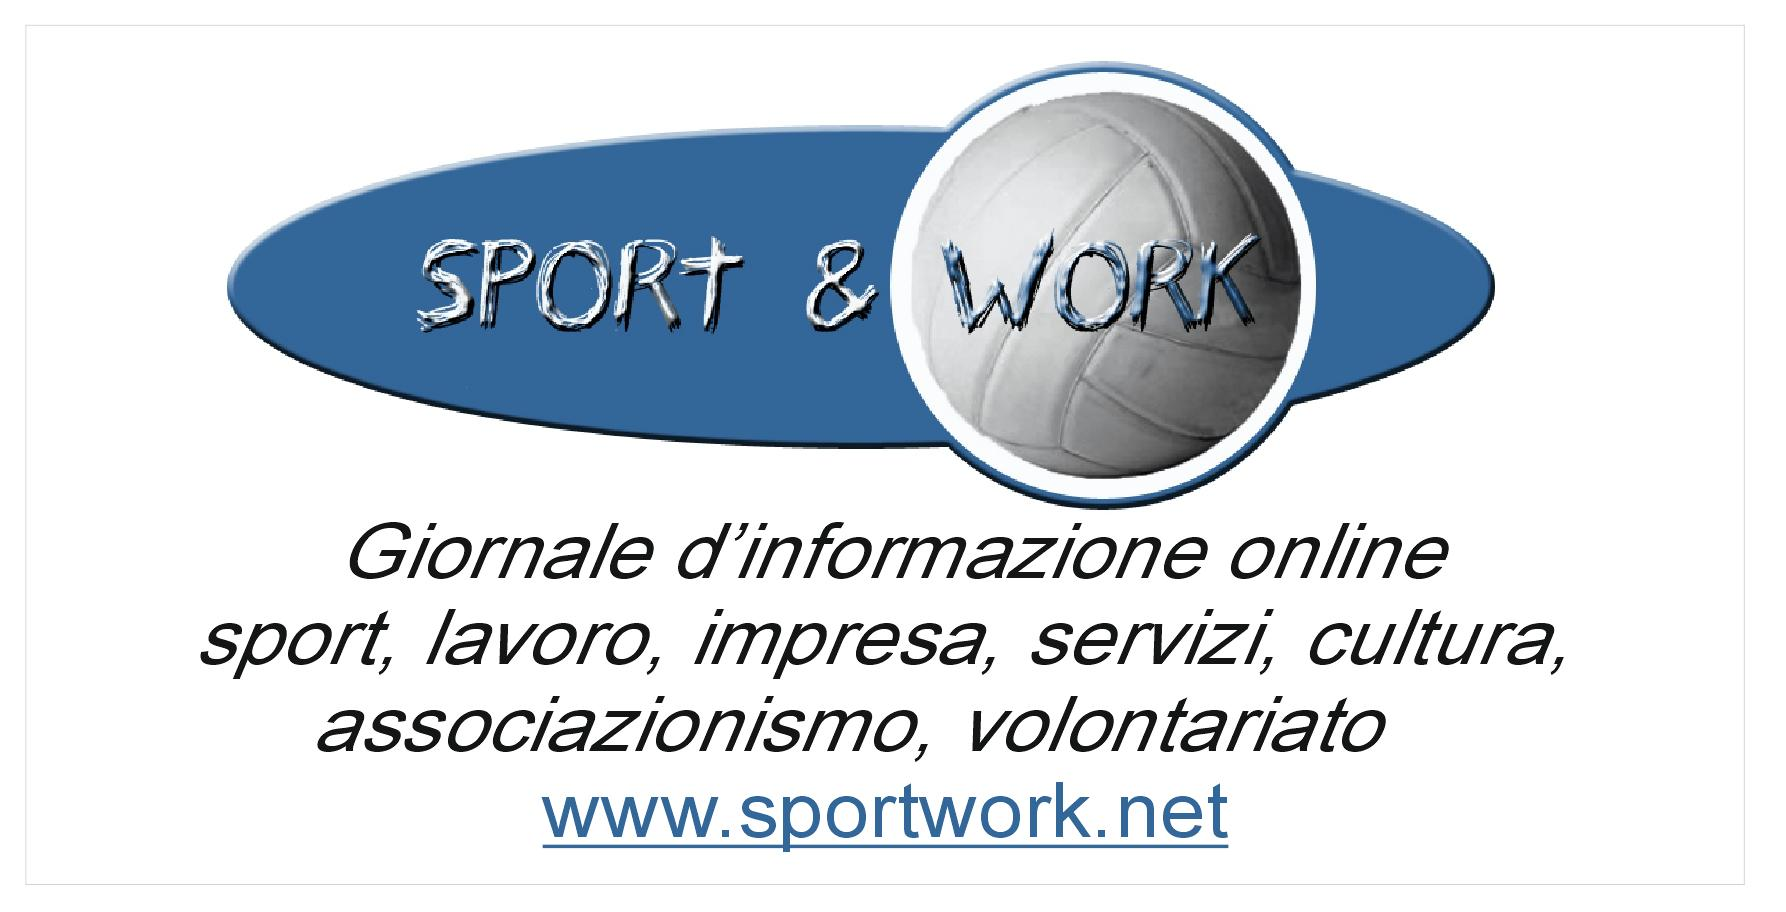 Sport & Work ricerca venditore spazi pubblicitari